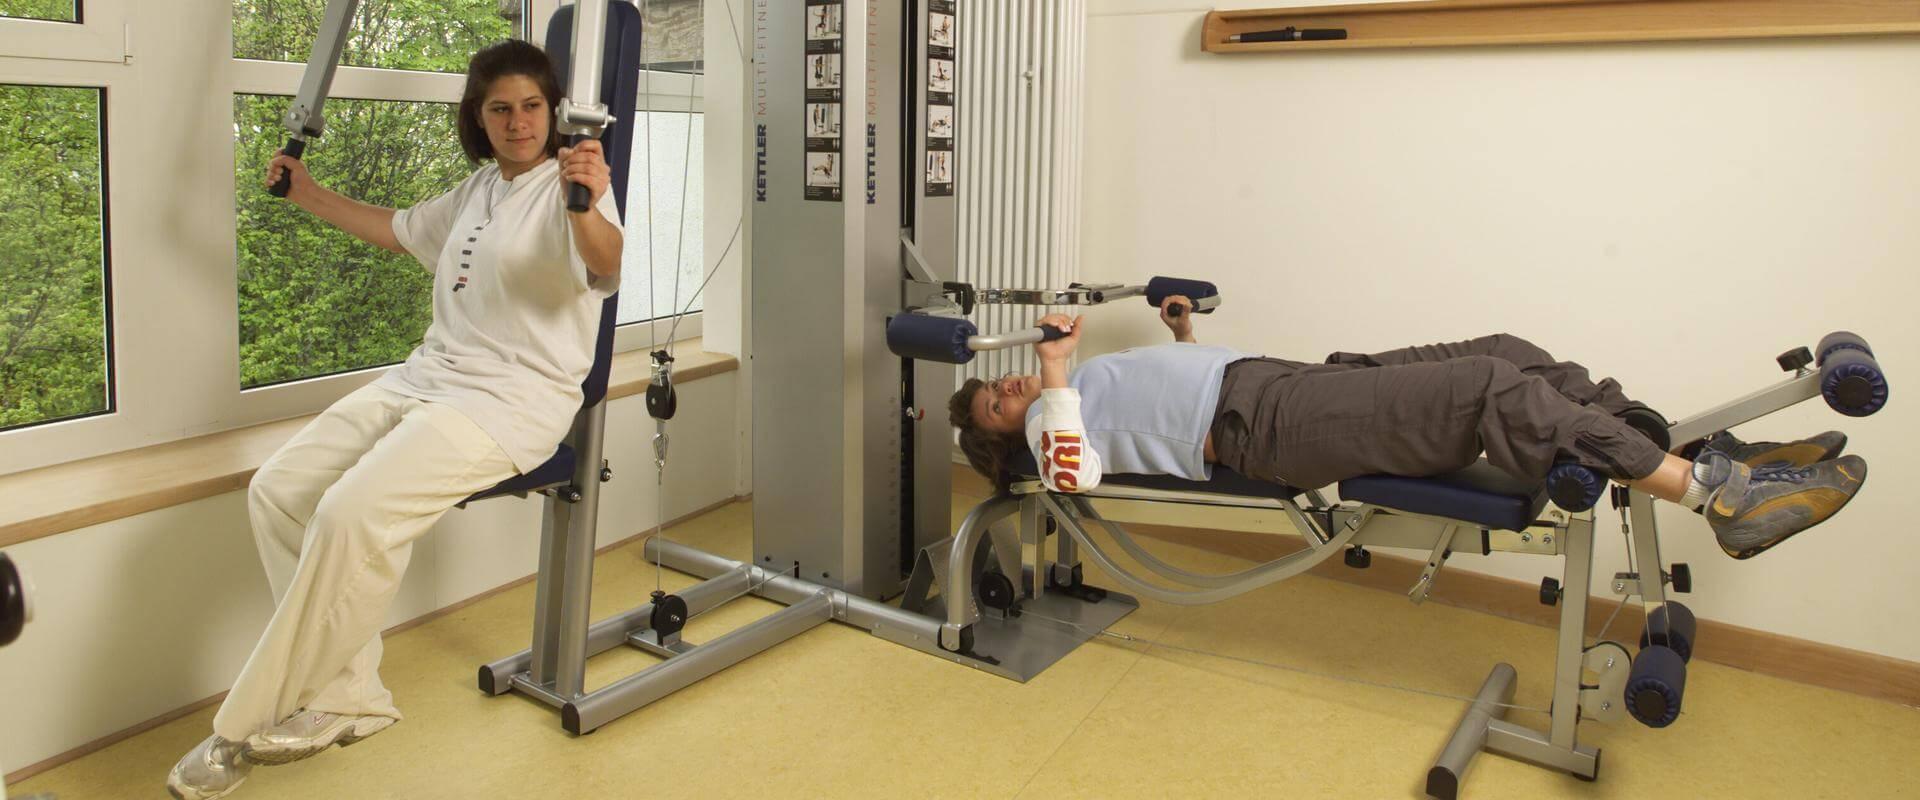 MEDIAN Kliniken Daun Altburg Fitnessraum